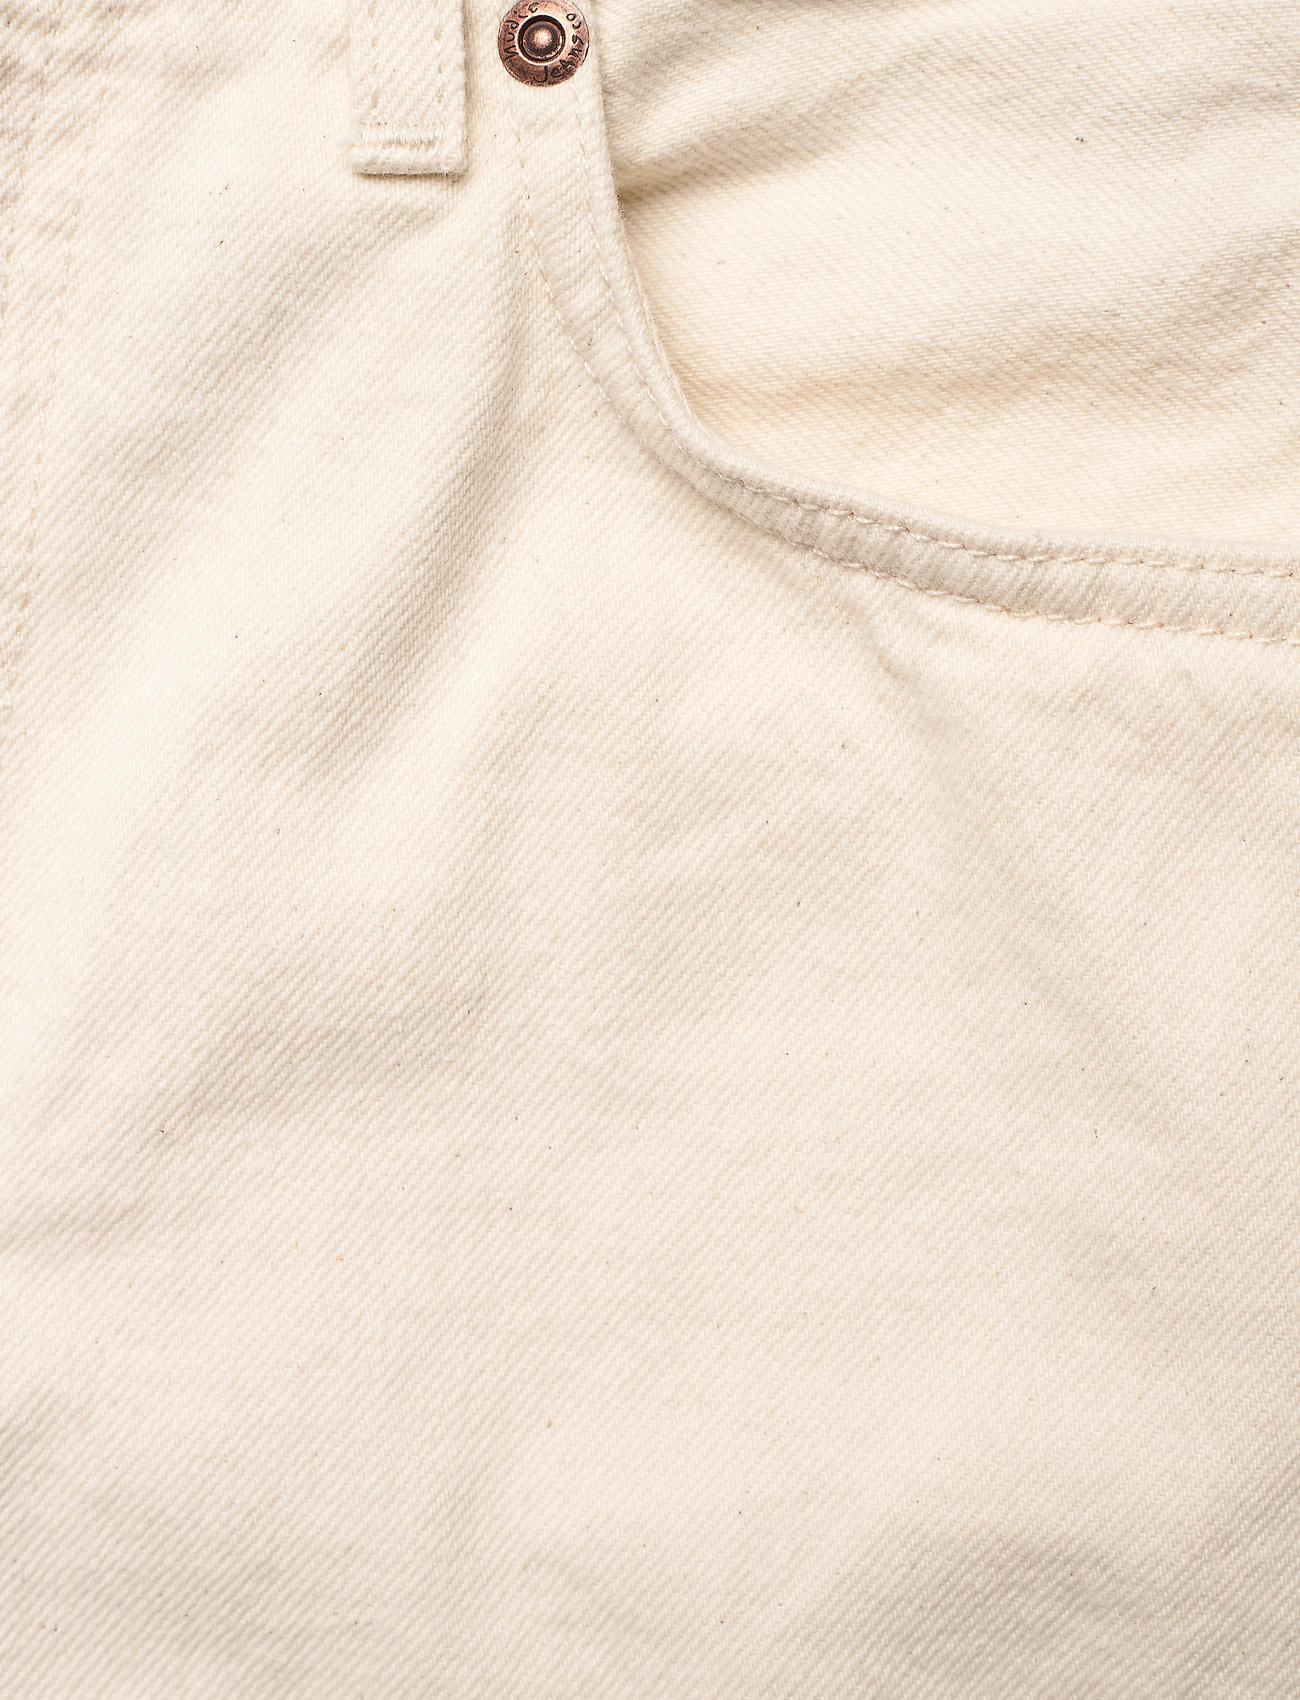 Nudie Jeans - Breezy Britt - straight regular - dusty white - 6